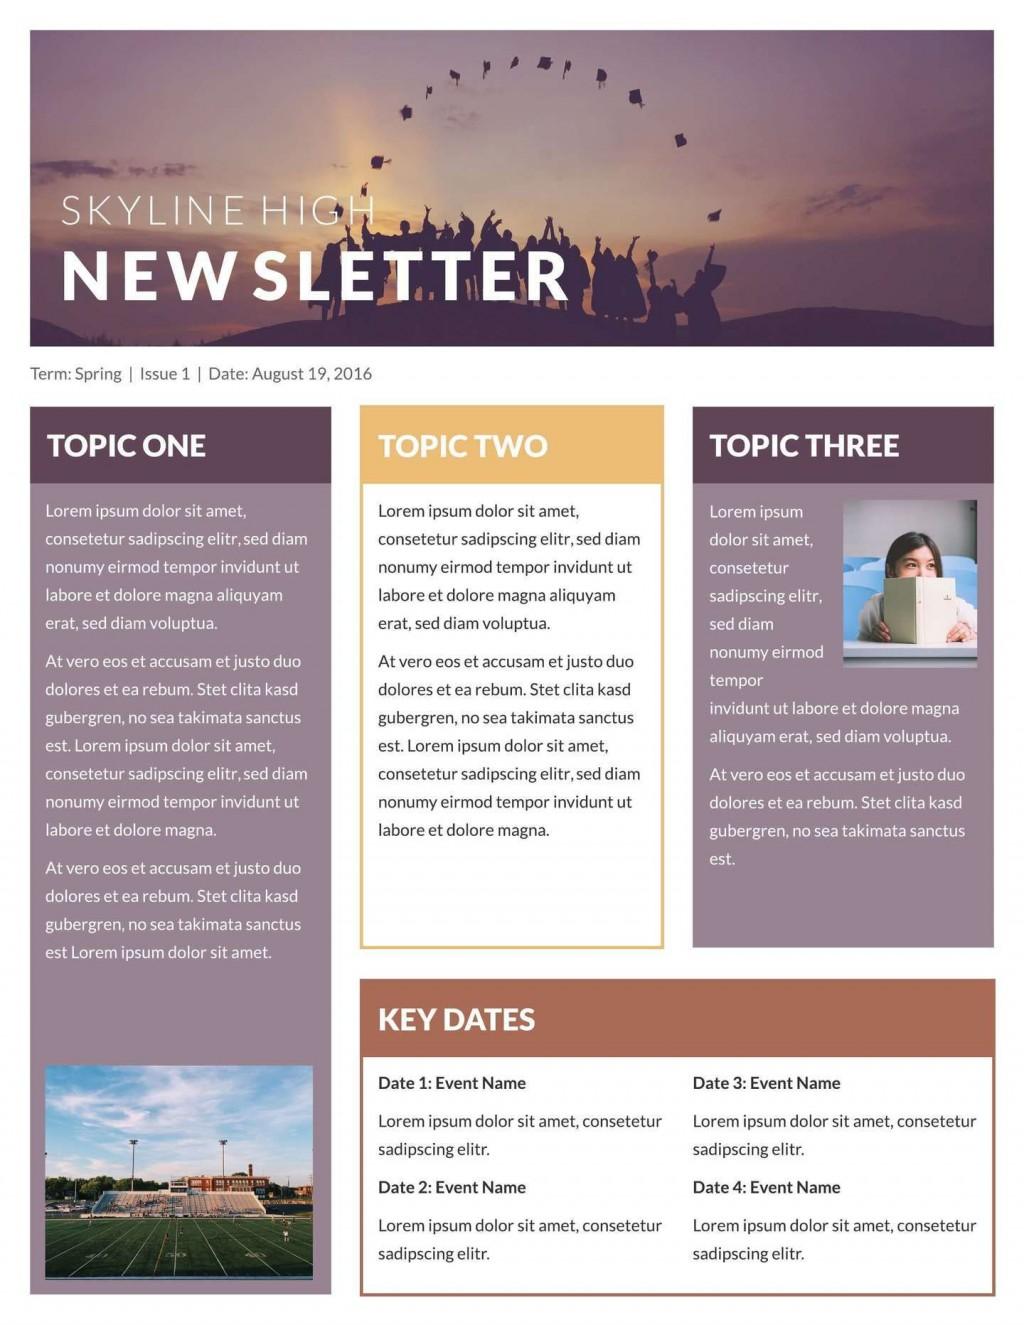 004 Singular Free Printable Newsletter Template High Def  Templates For Church PreschoolLarge